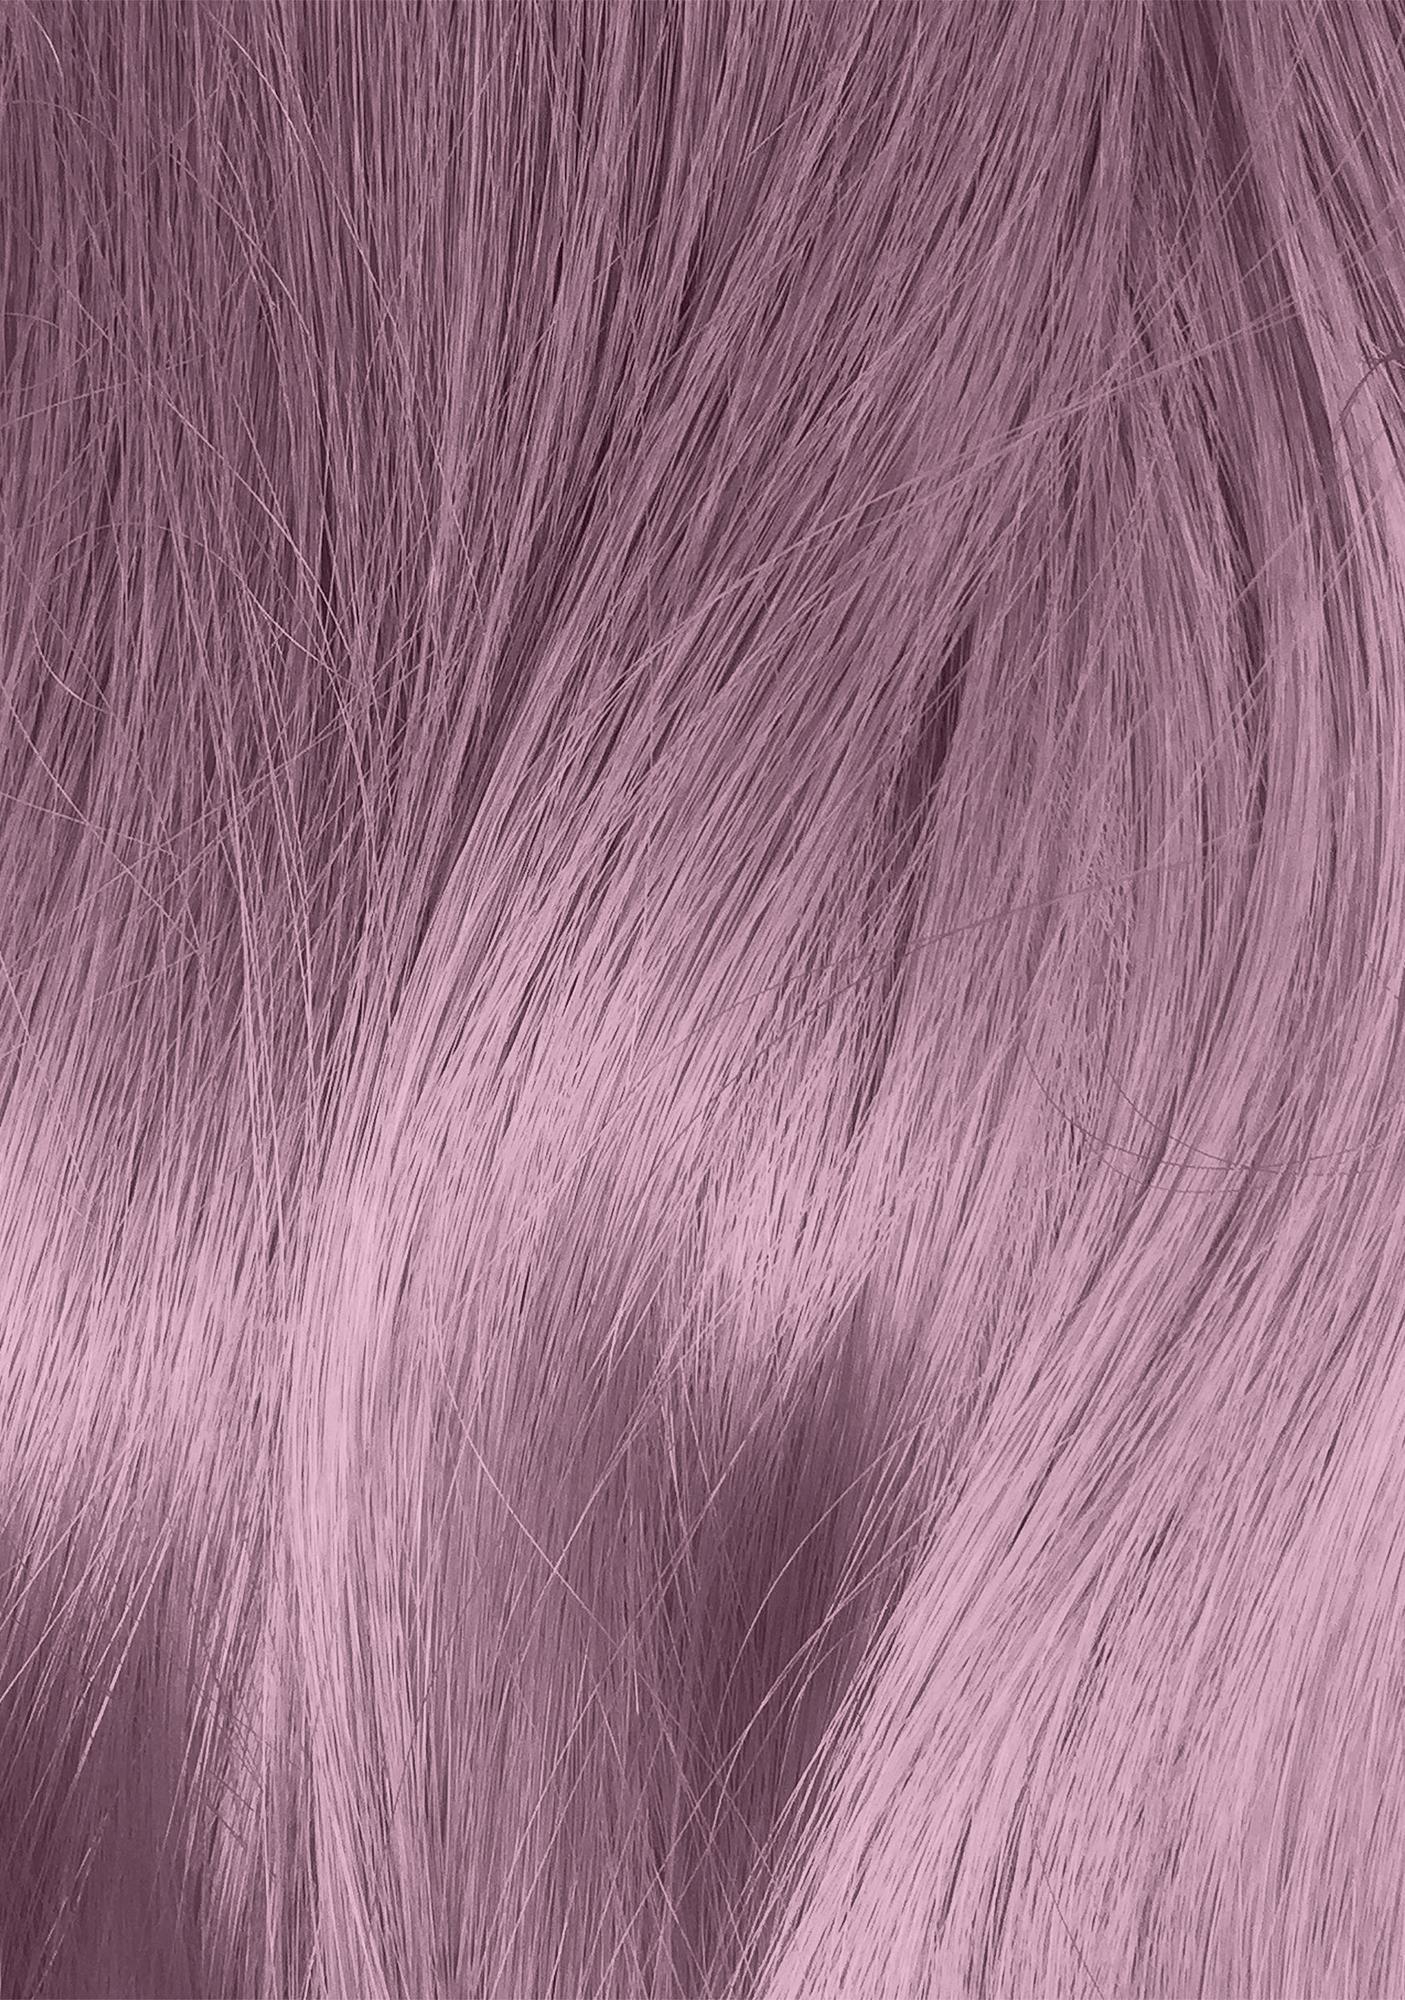 Lime Crime Oyster Unicorn Hair Dye